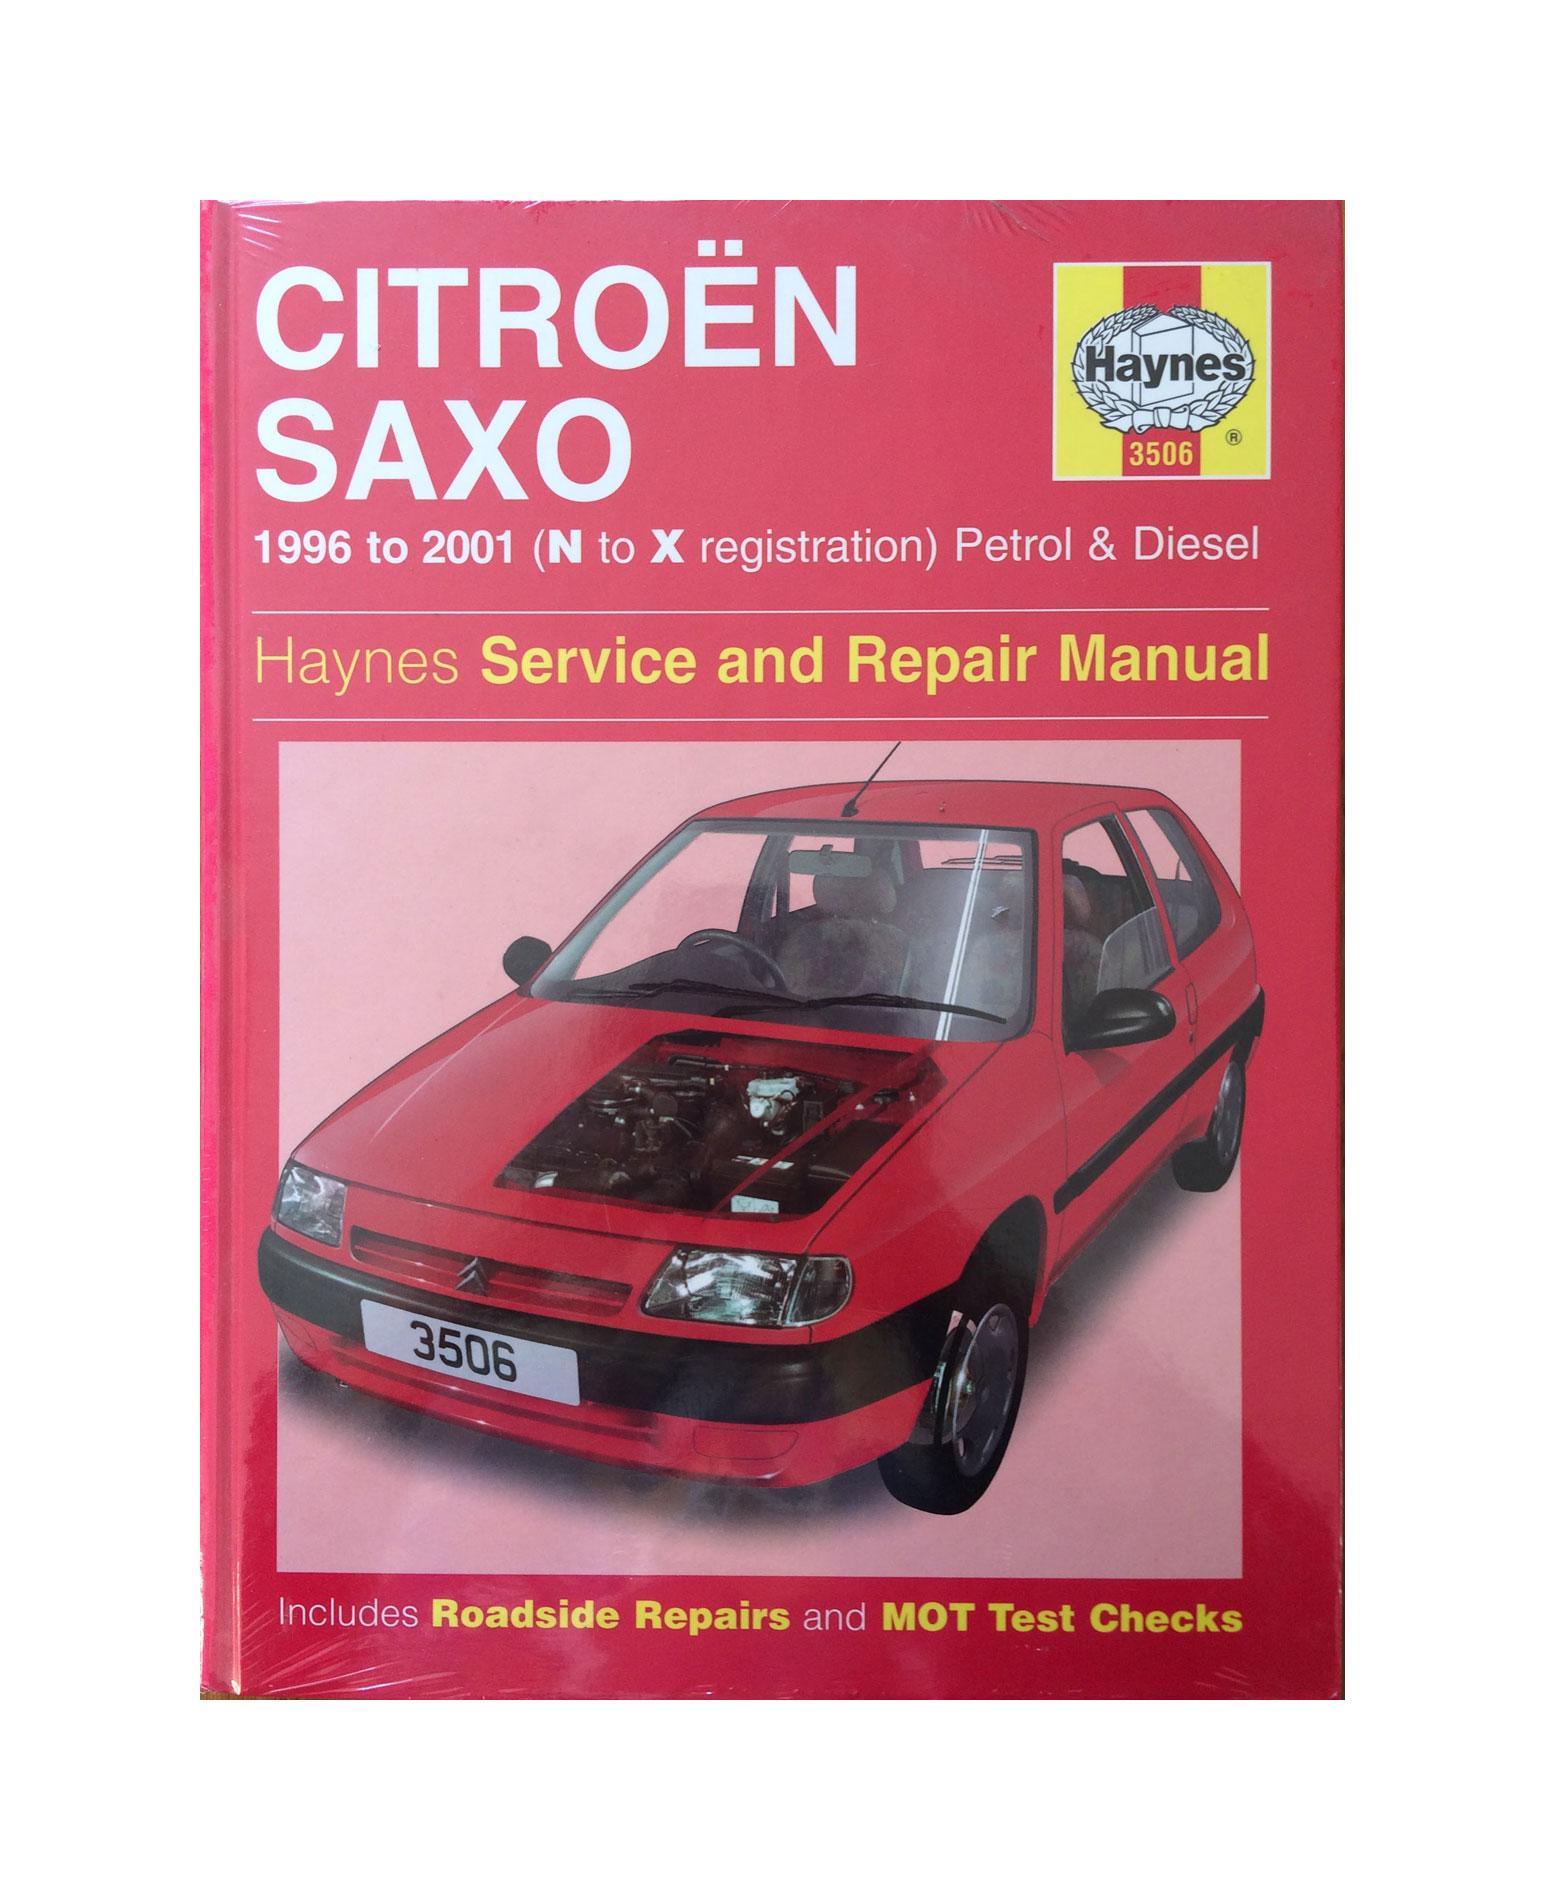 citroen saxo n x reg petrol diesel haynes service repair rh ebay co uk White Citroen Saxo Modified Citroen Saxo